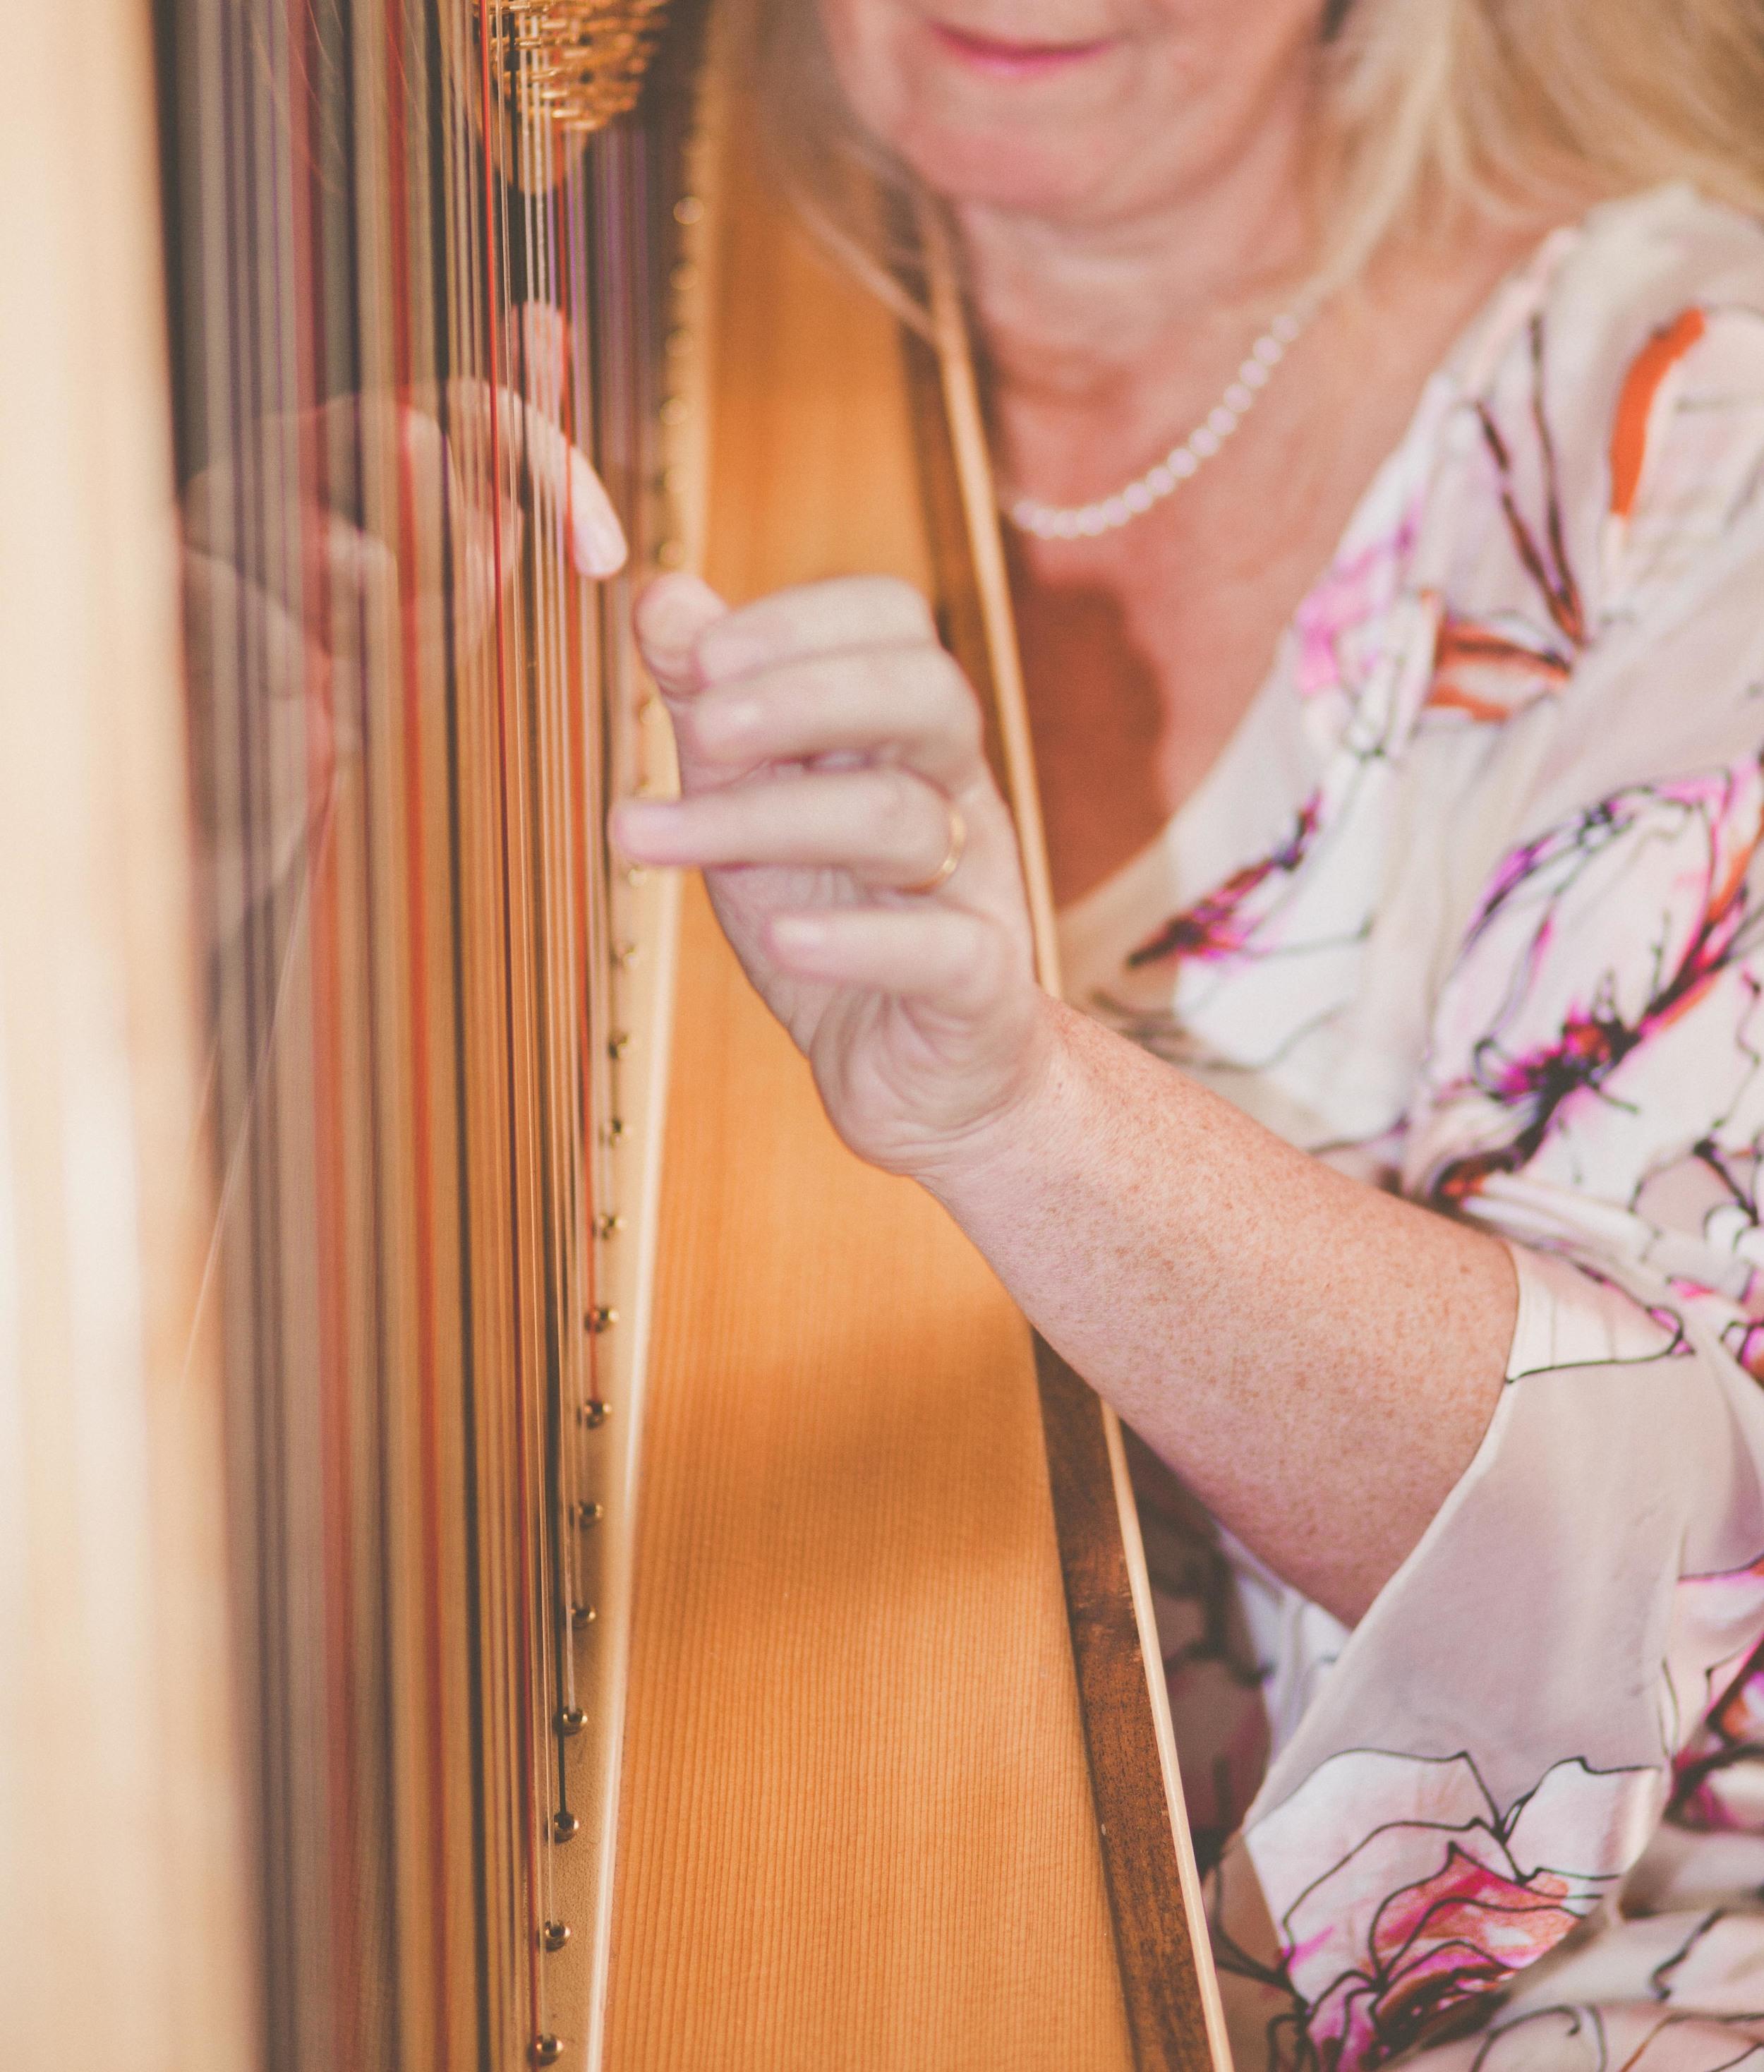 018  - Xenia Horne UK Harpist by Mark Pugh www.markpugh.com -18.JPG